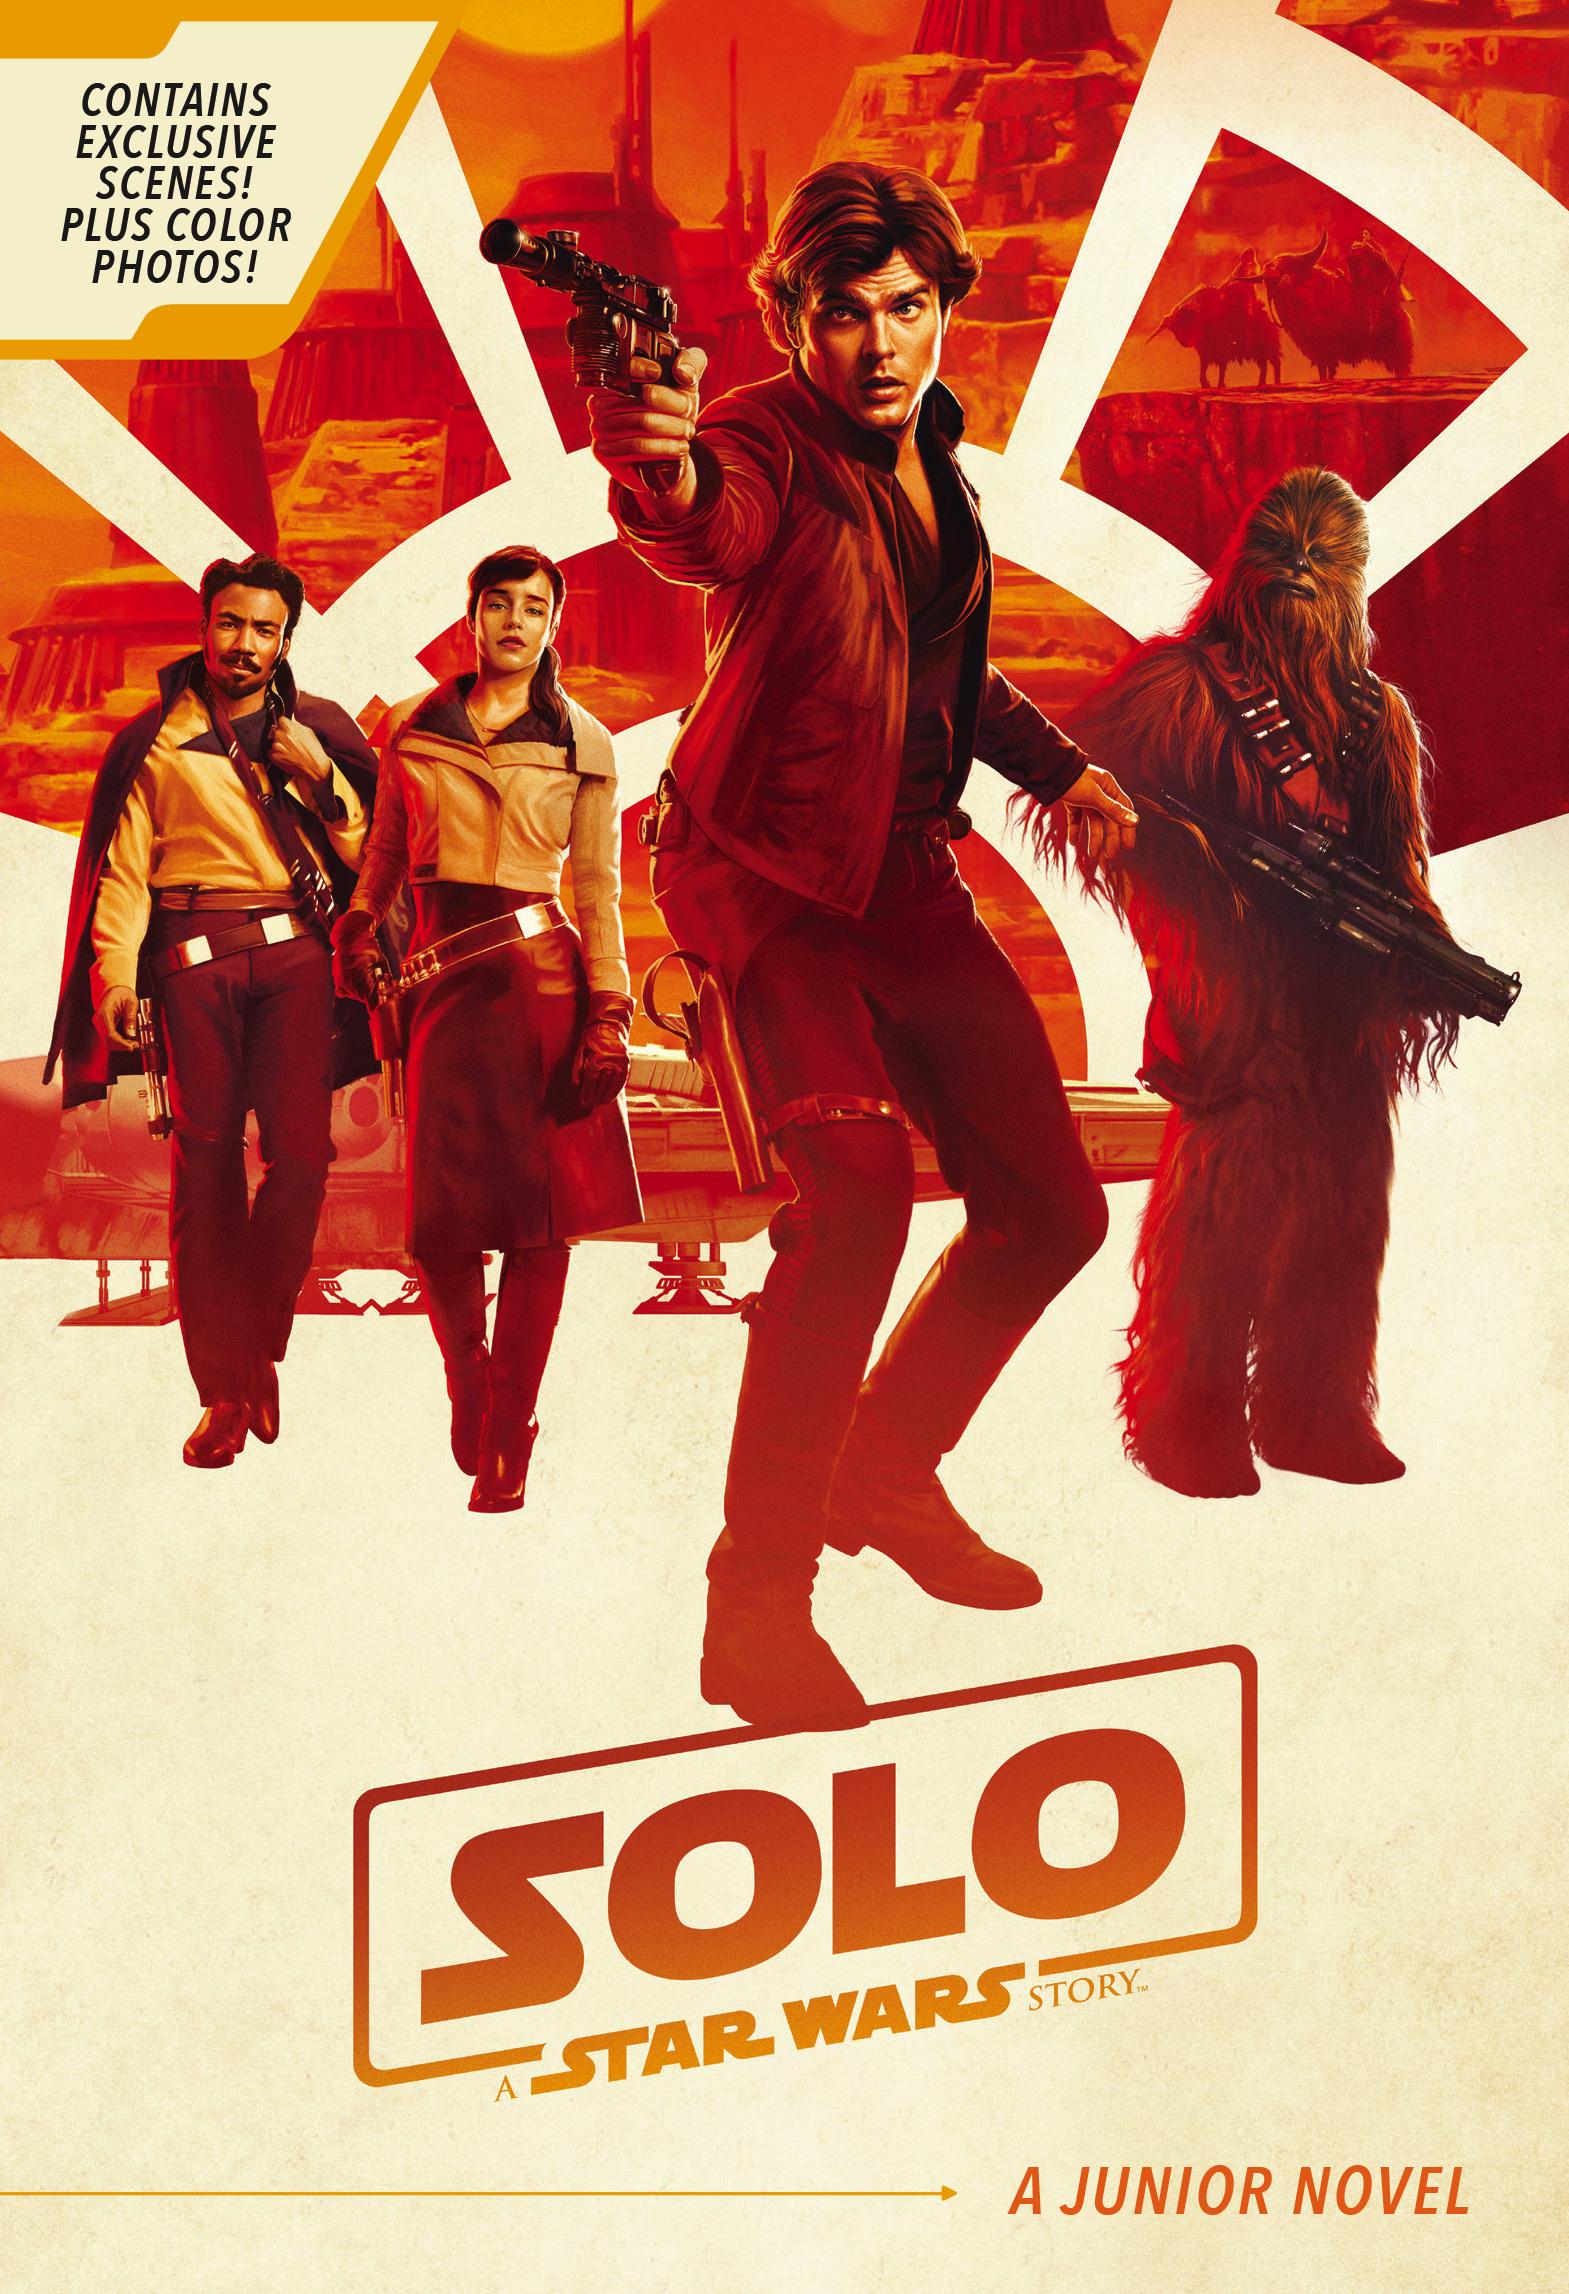 Solo: A Star Wars Story: A Junior Novel